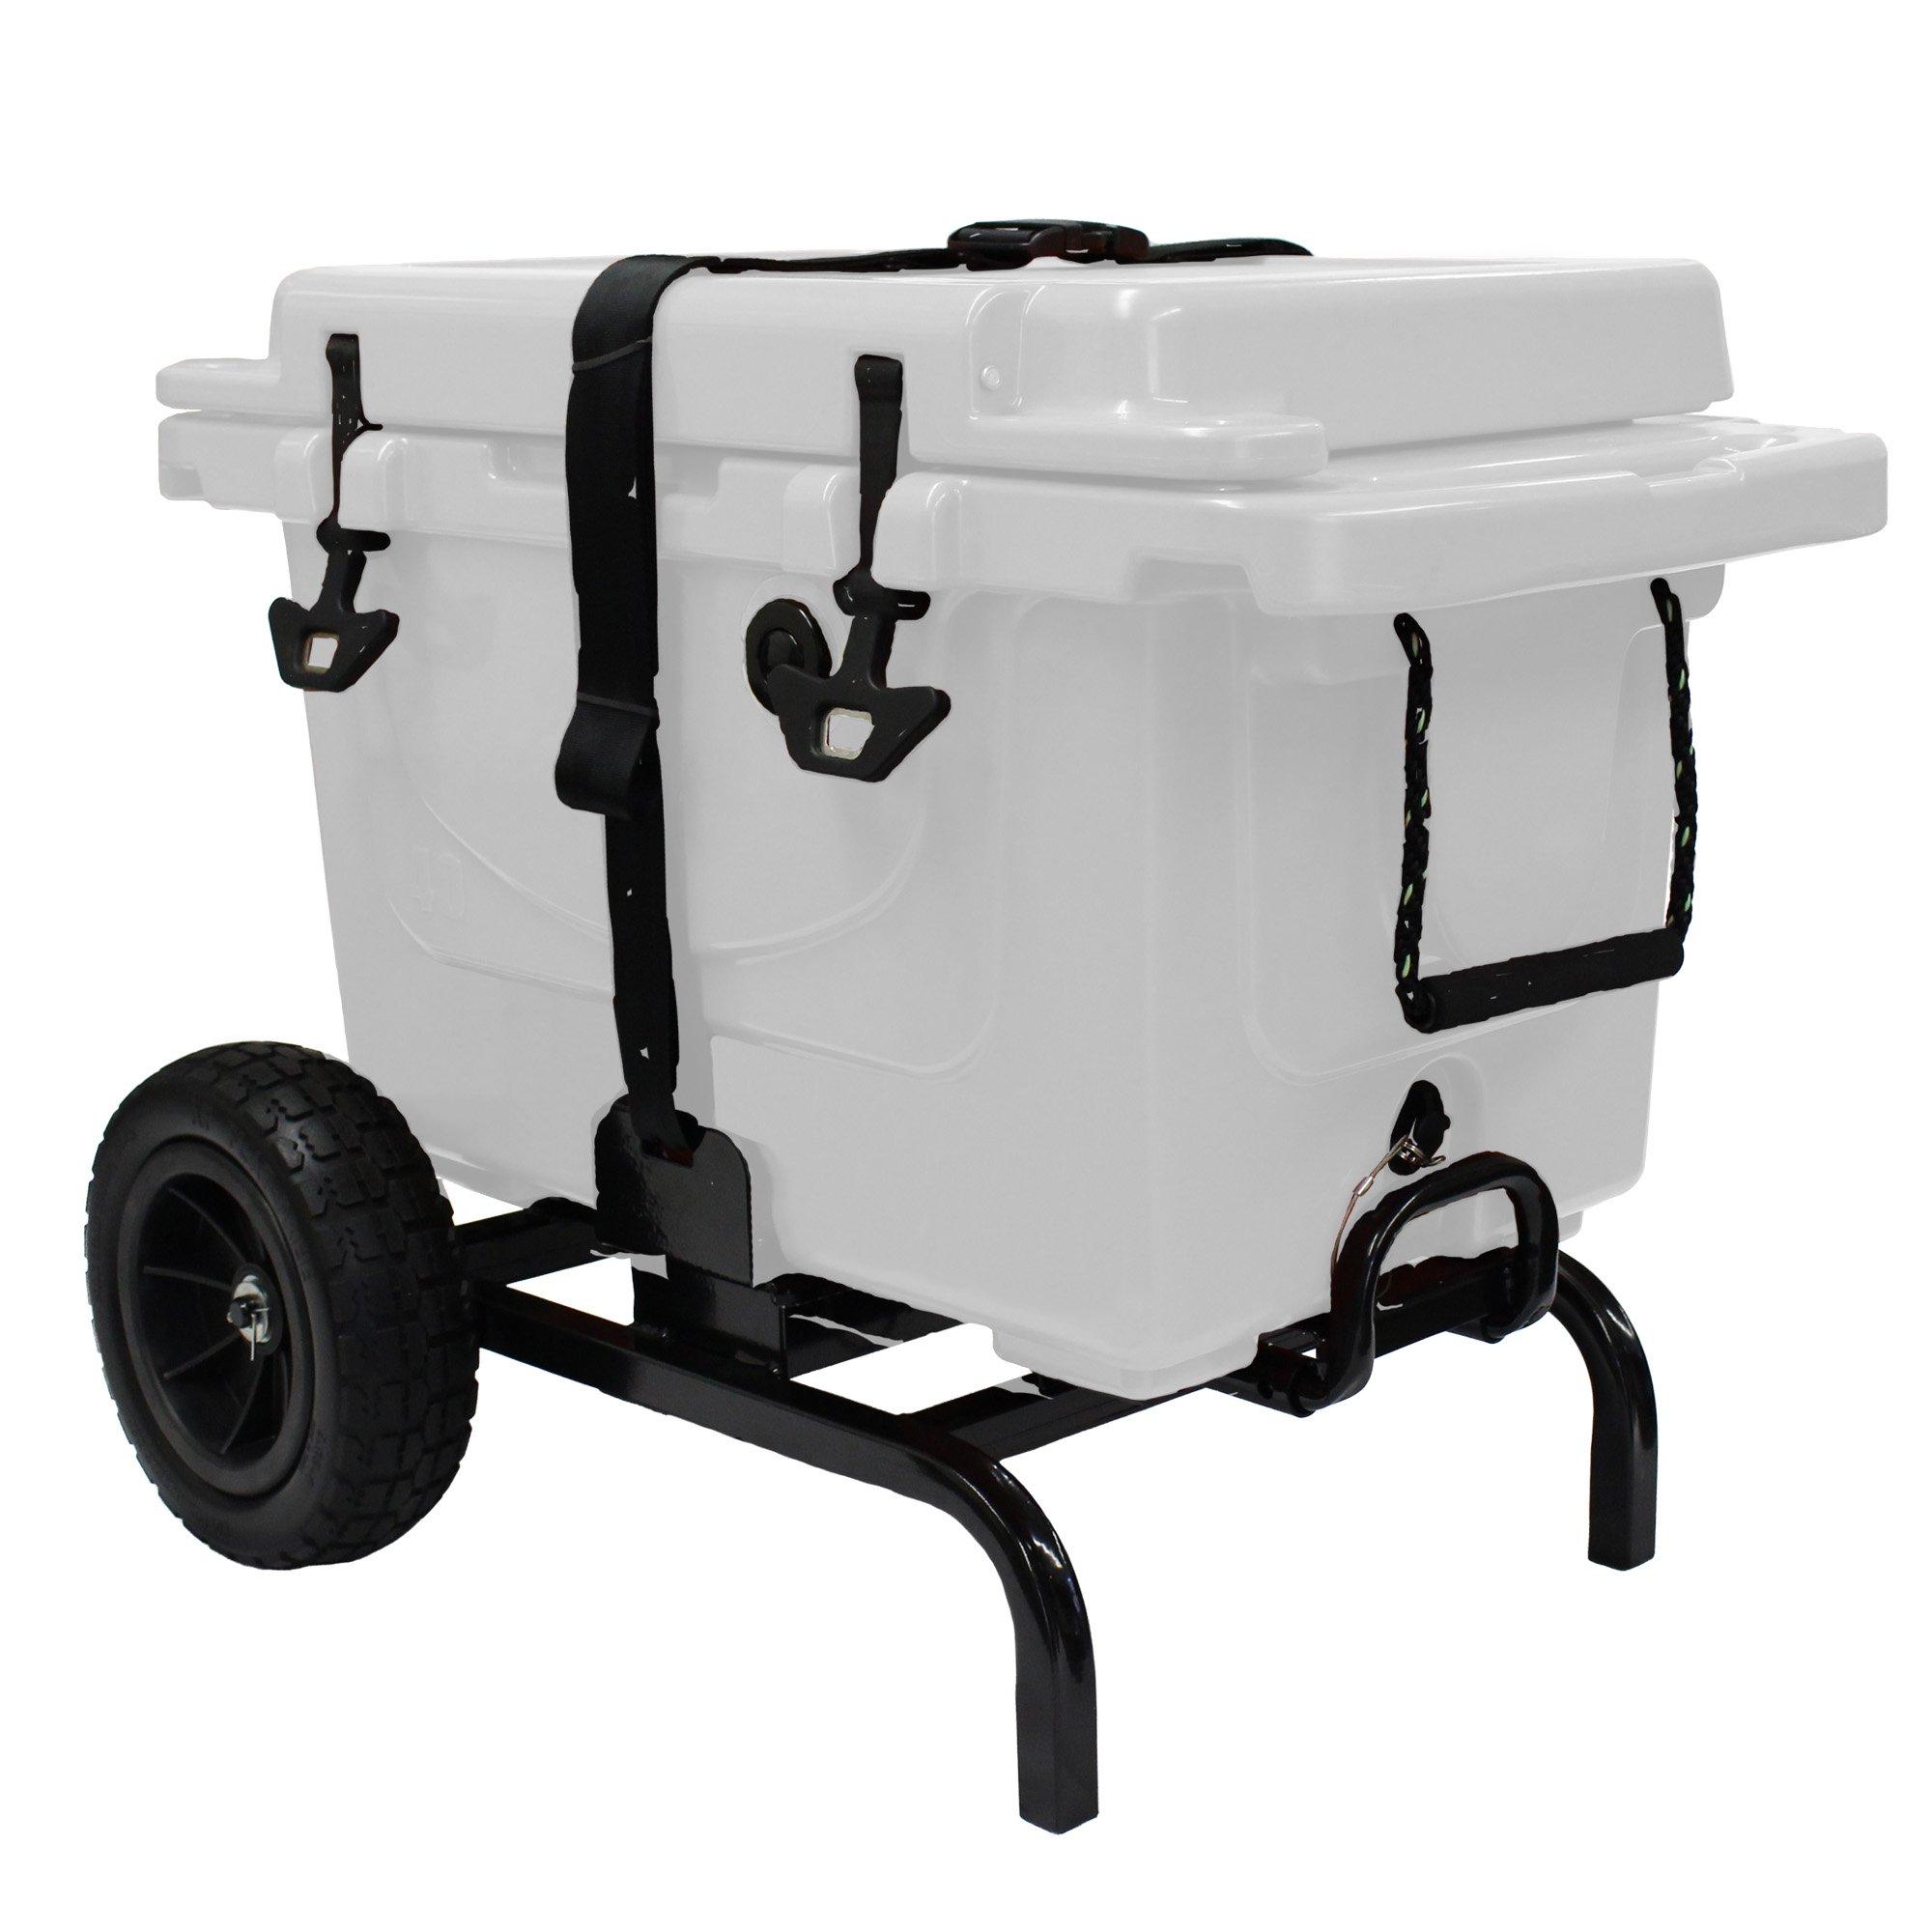 Garden Star 70135 Universal Fit Cooler Cart, Black by Garden Star (Image #2)